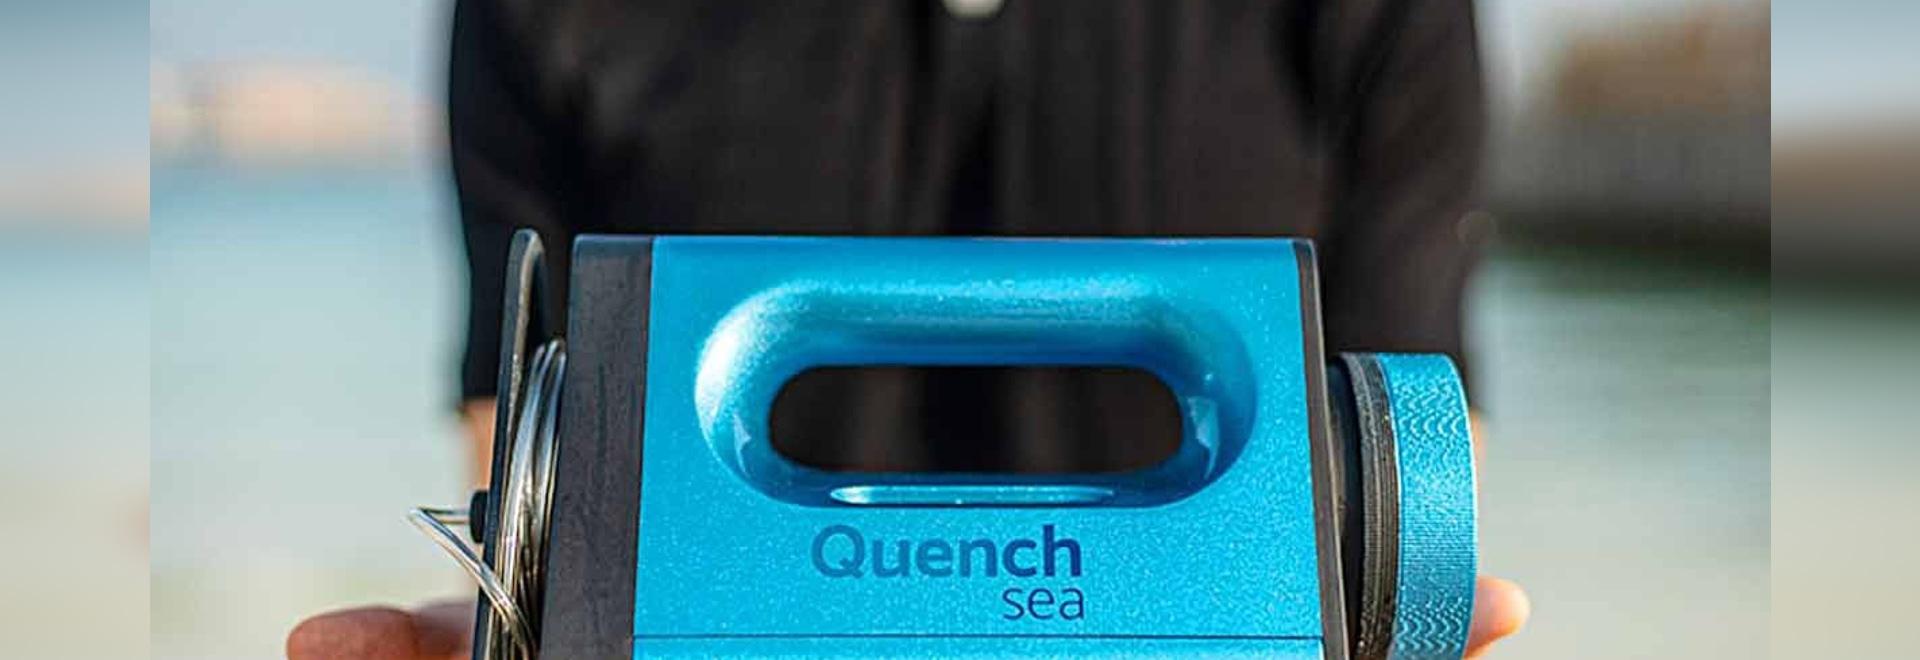 Handheld Desalinator to Go into Production